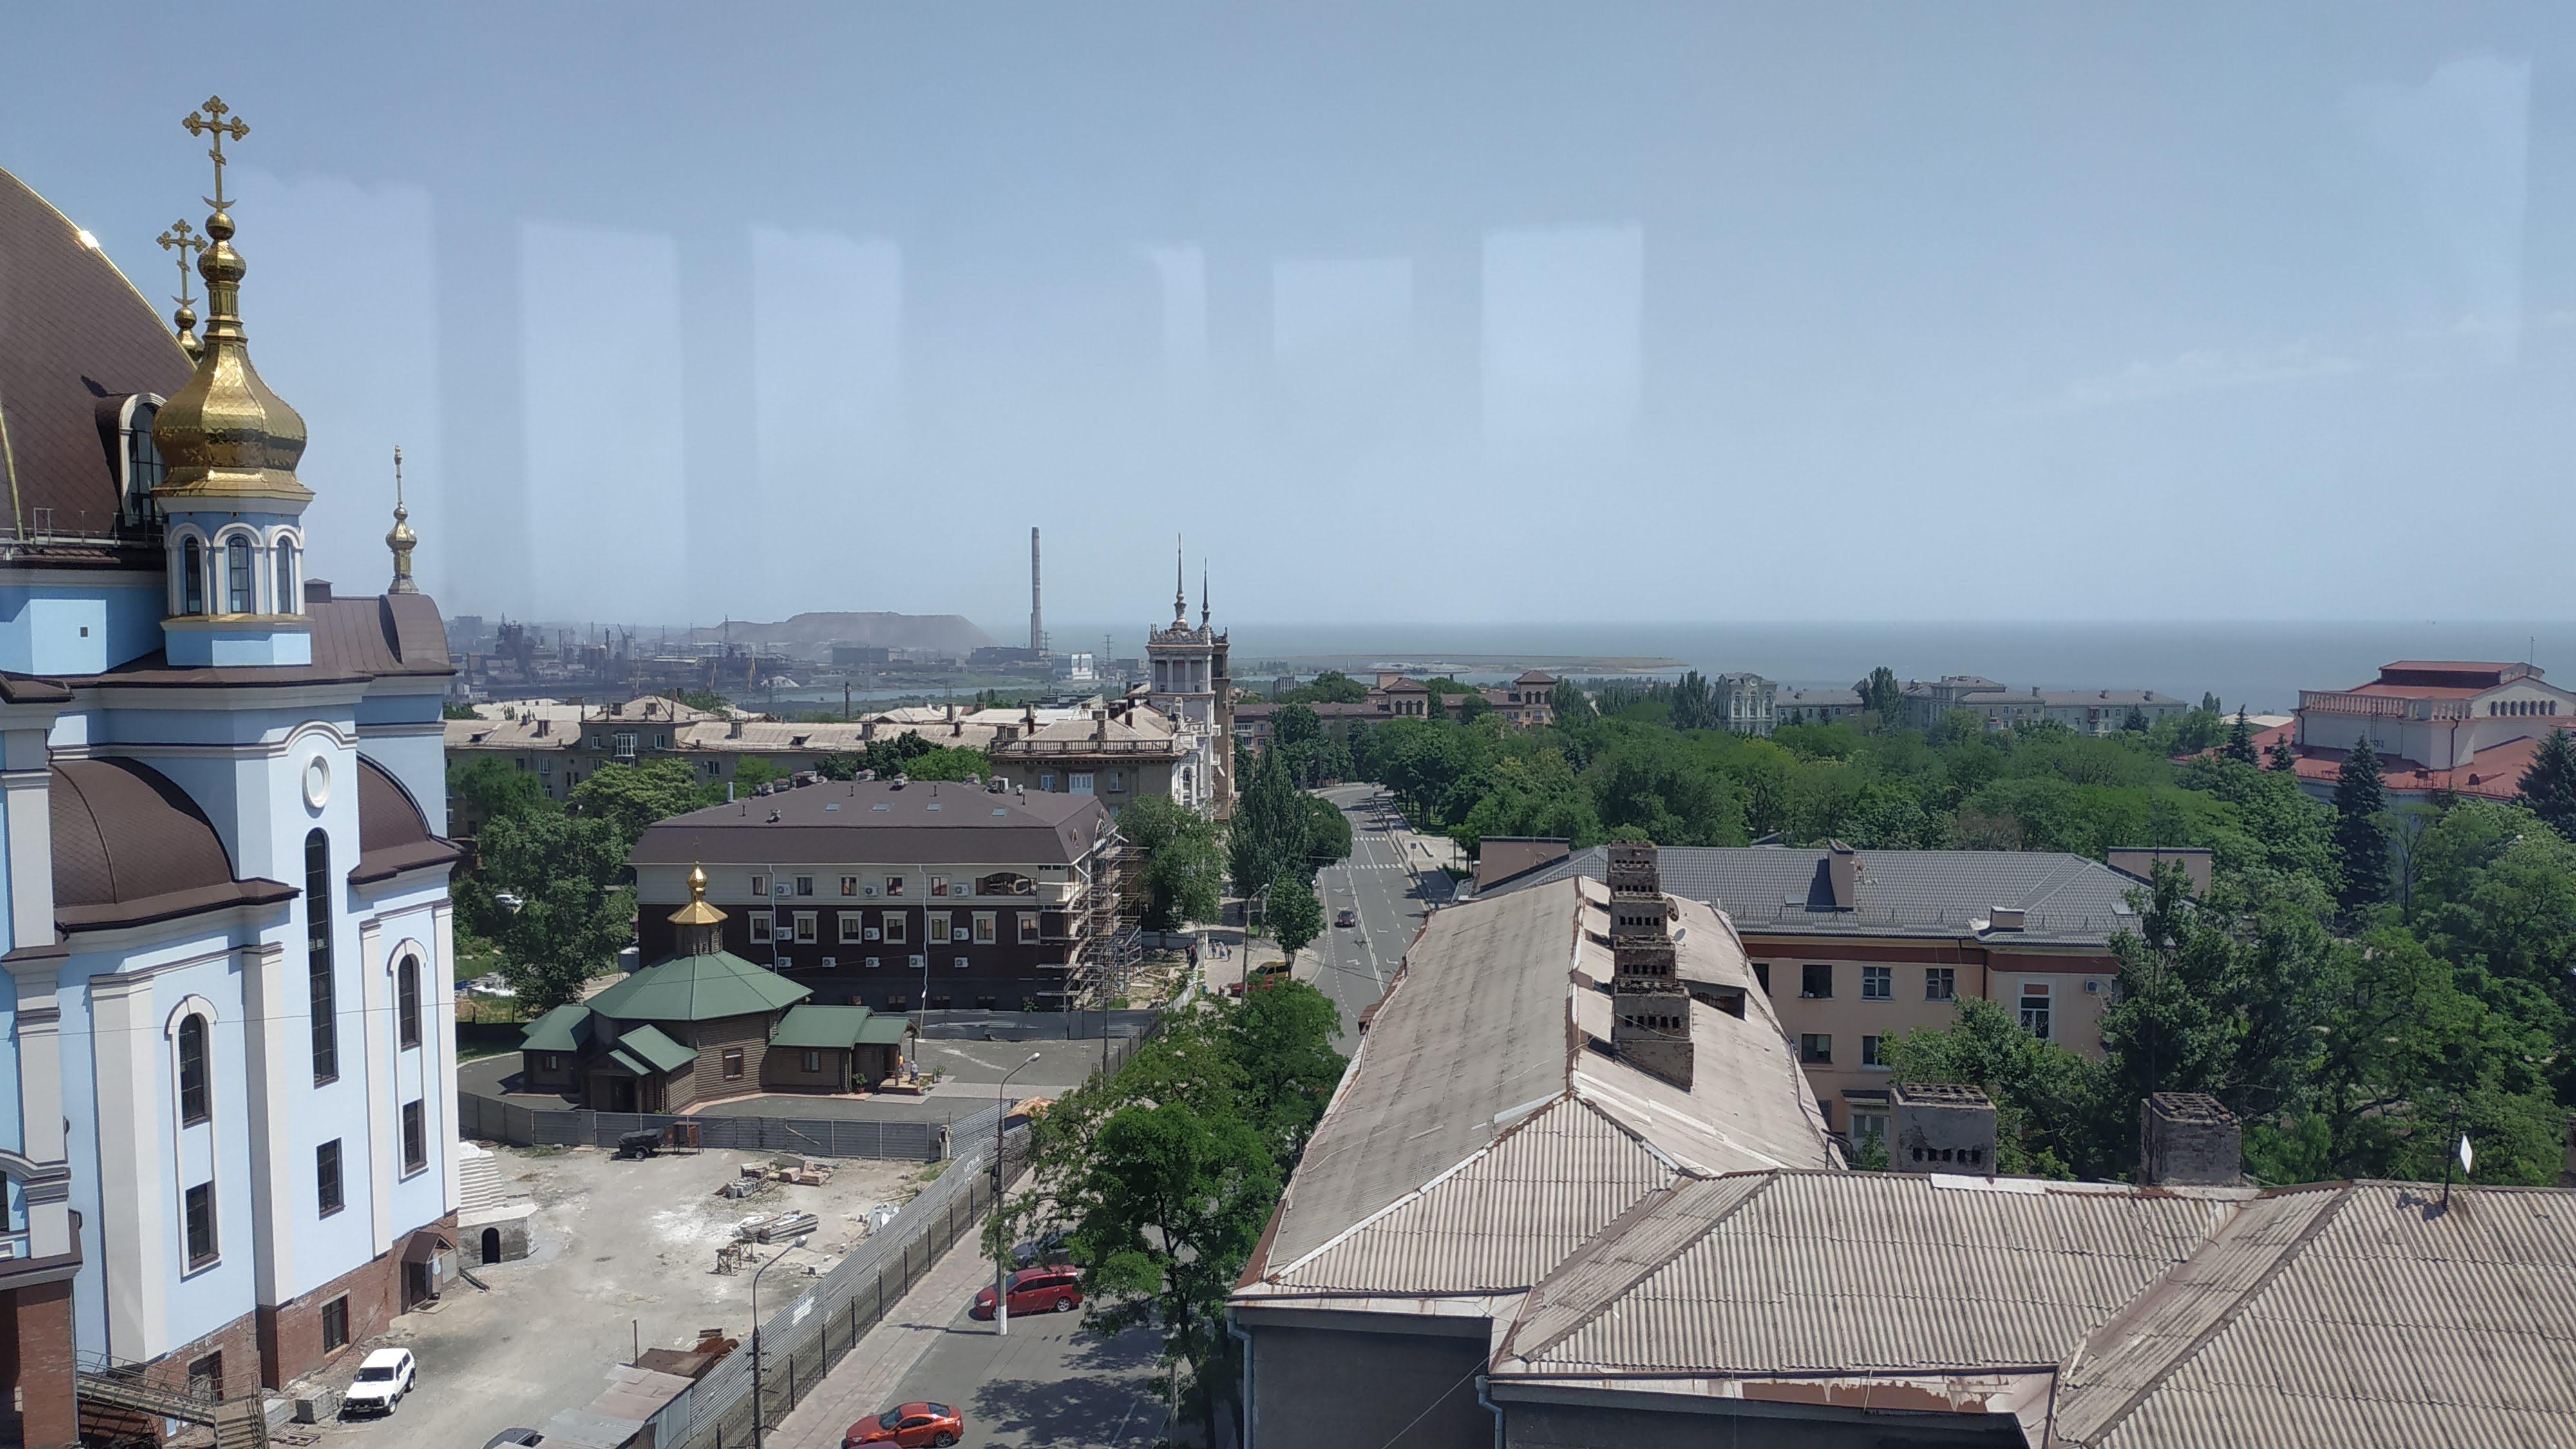 Panorama sulla zona industriale di Mariupol - foto di Claudia Bettiol